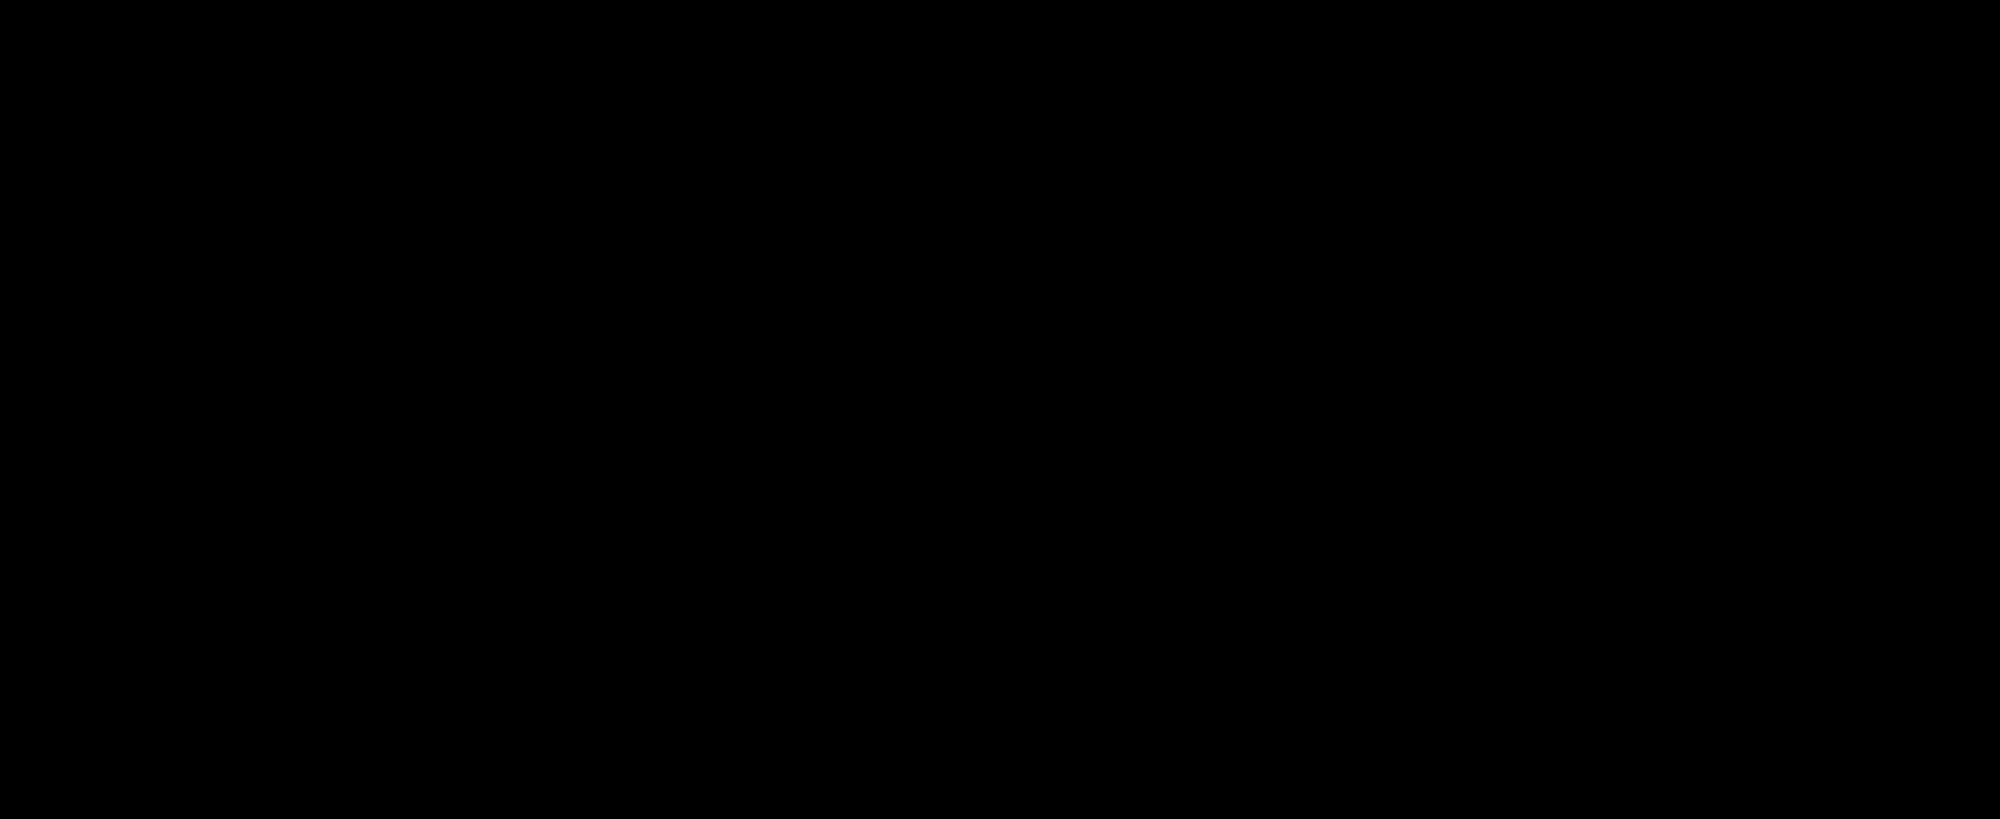 Dolutegravir formula